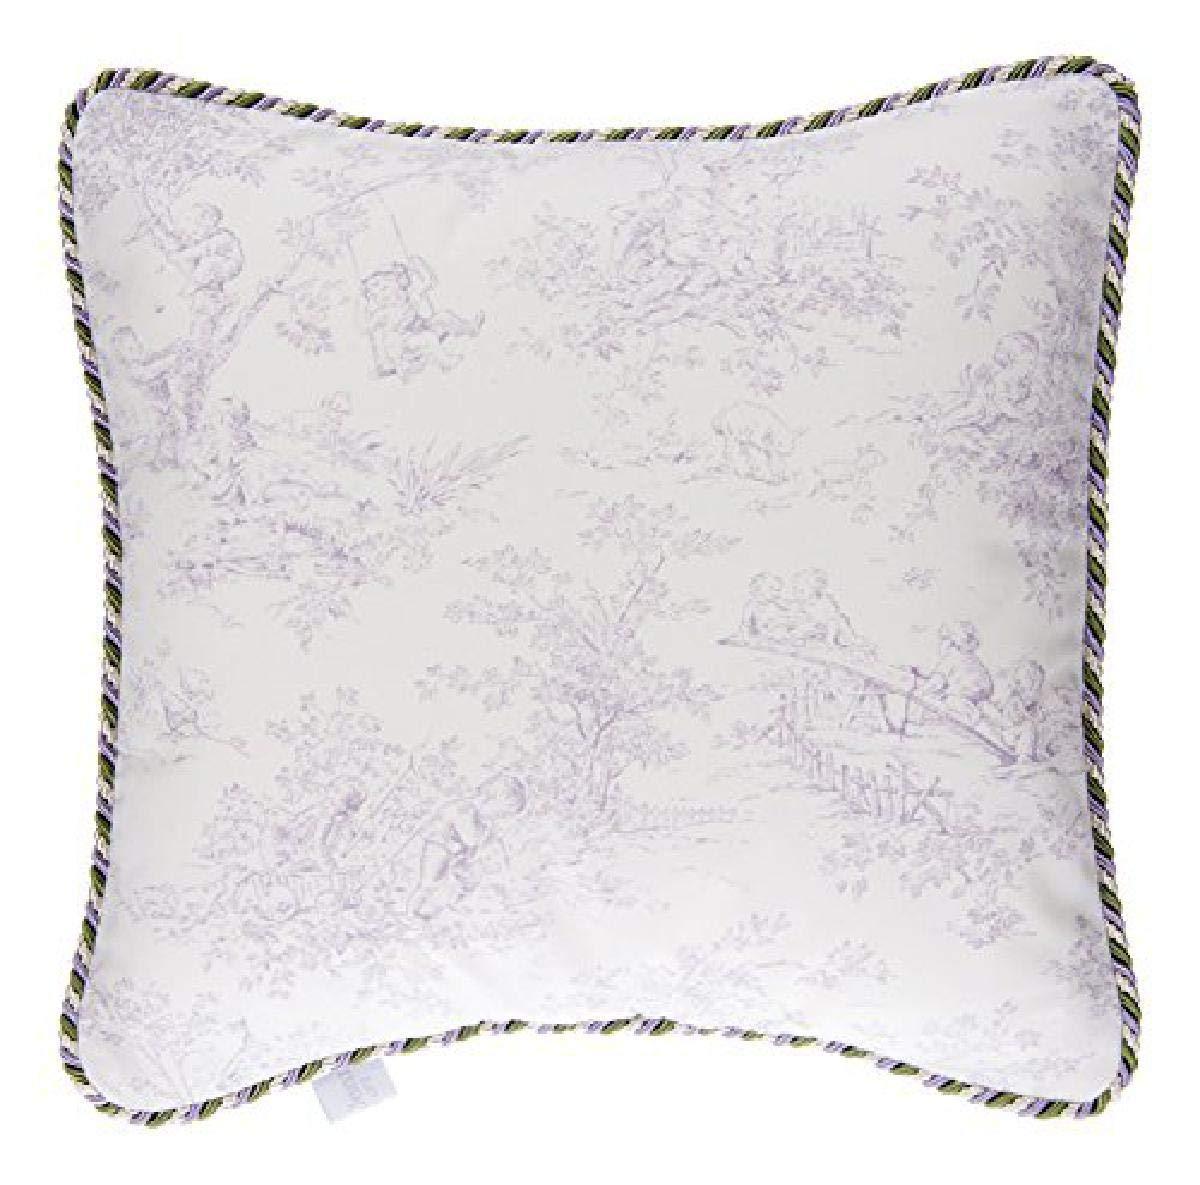 Lavender//White Glenna Jean Mfg Glenna Jean Penelope Pillow Toile Lavender 11315